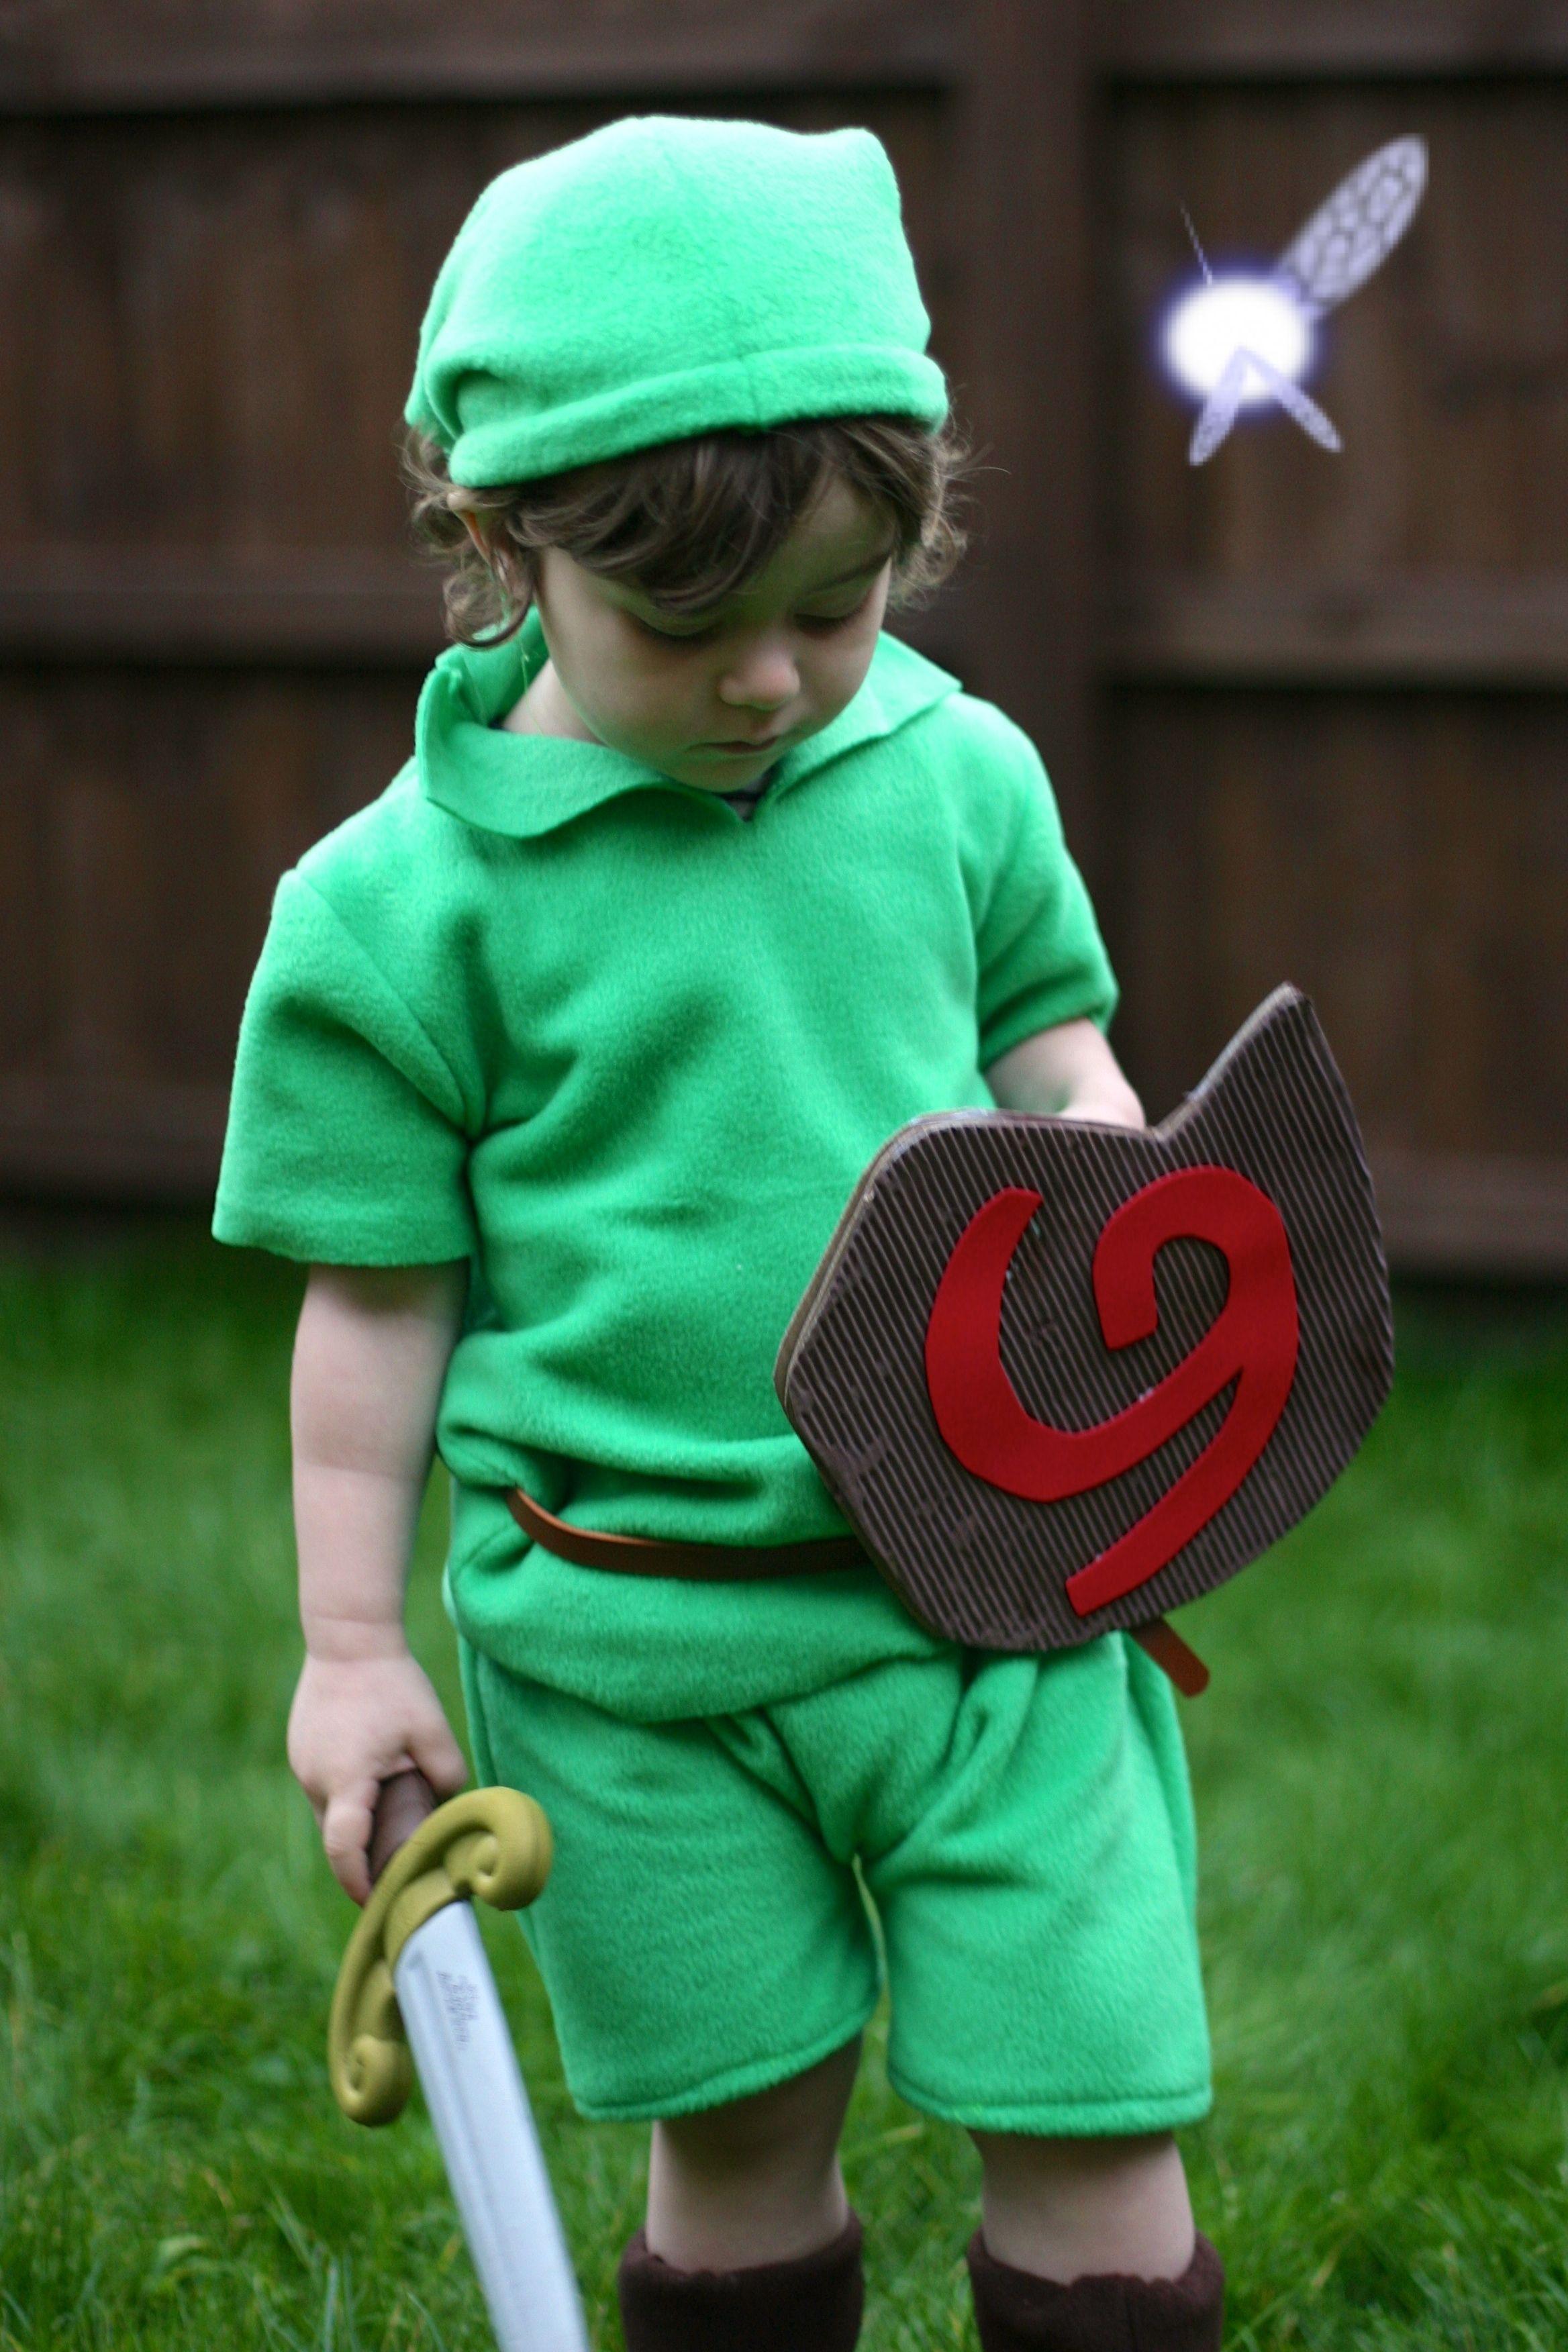 Kid Link costume from Zelda Ocarina of Time  sc 1 st  Pinterest & Kid Link costume from Zelda Ocarina of Time | Random | Pinterest ...